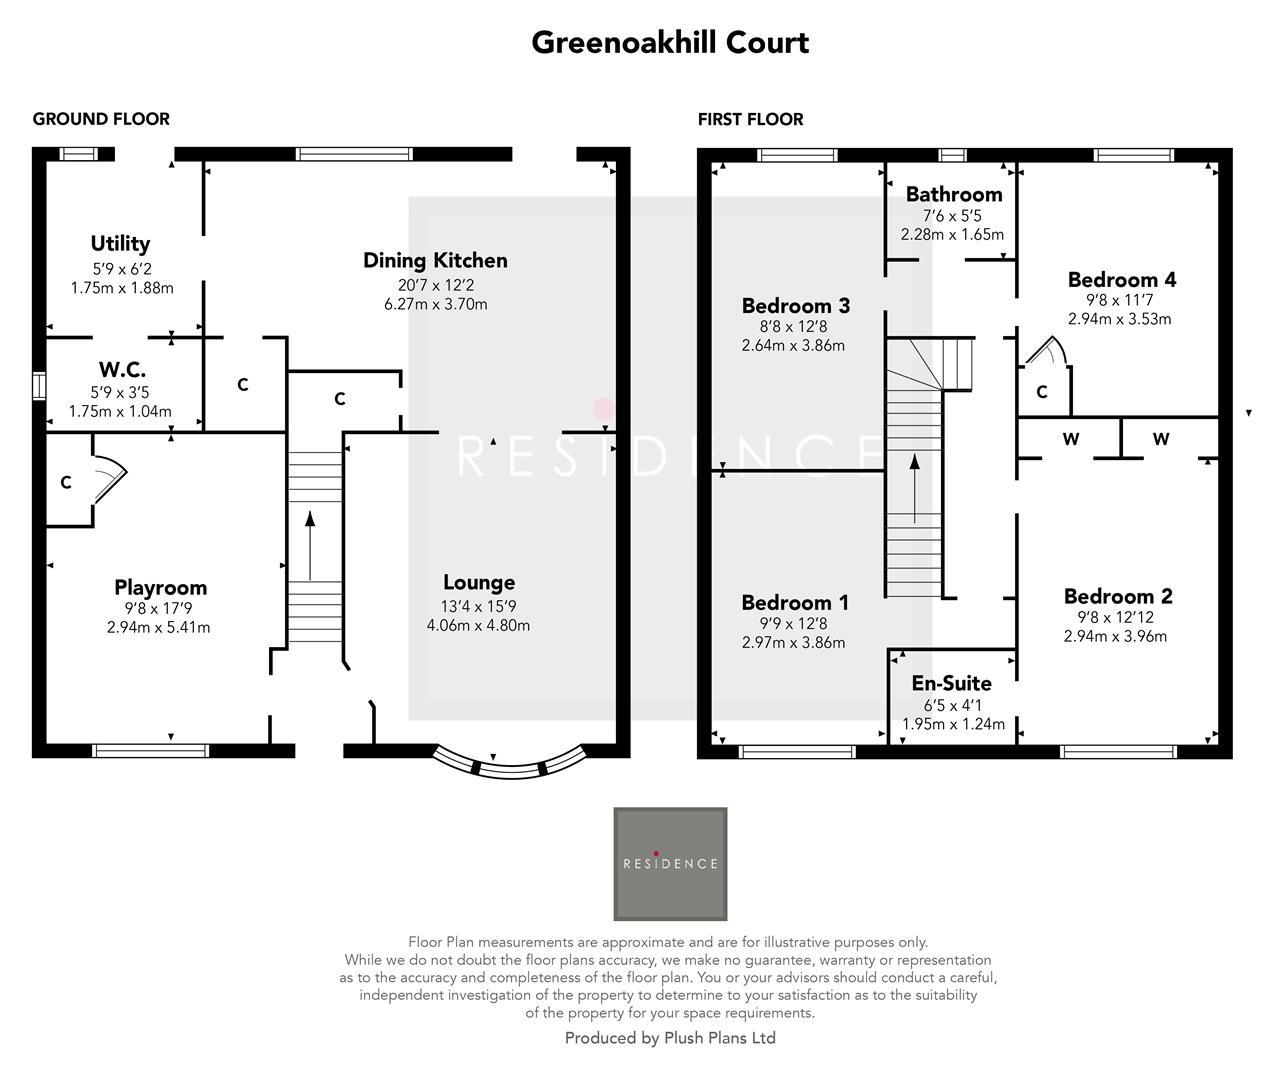 19 Greenoakhill Court_fp.jpg